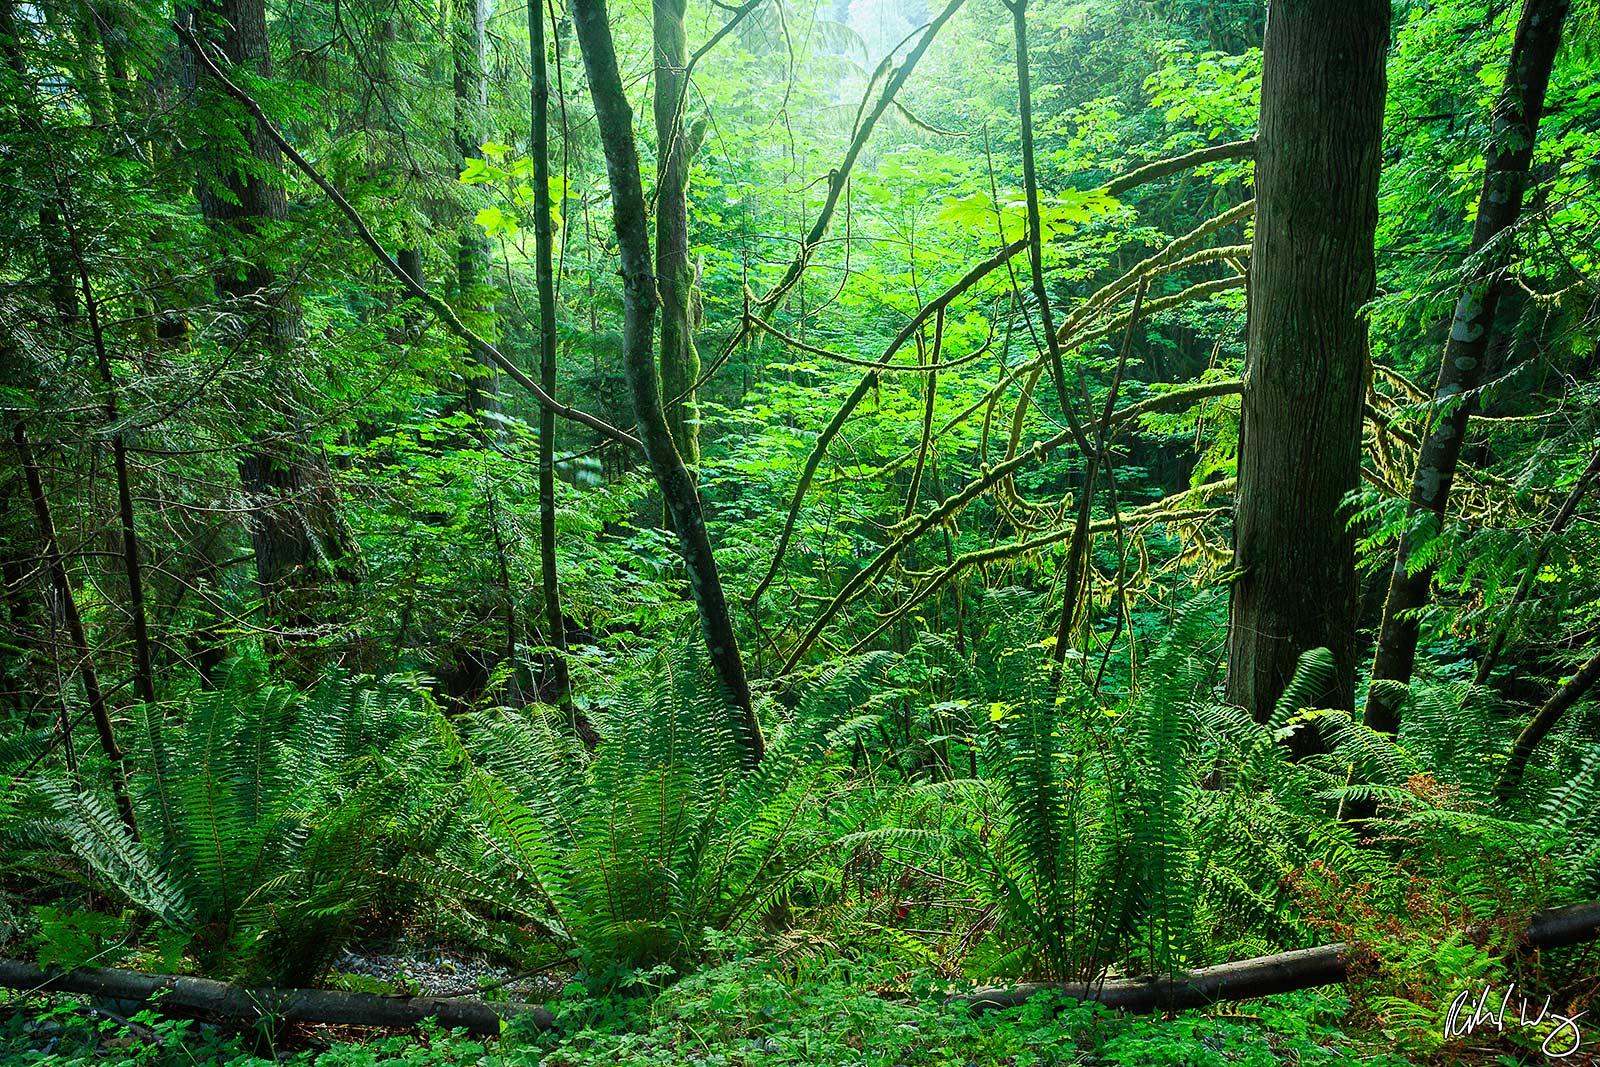 Temperate Rainforest - Capilano River Regional Park, North Vancouver, B.C., Canada